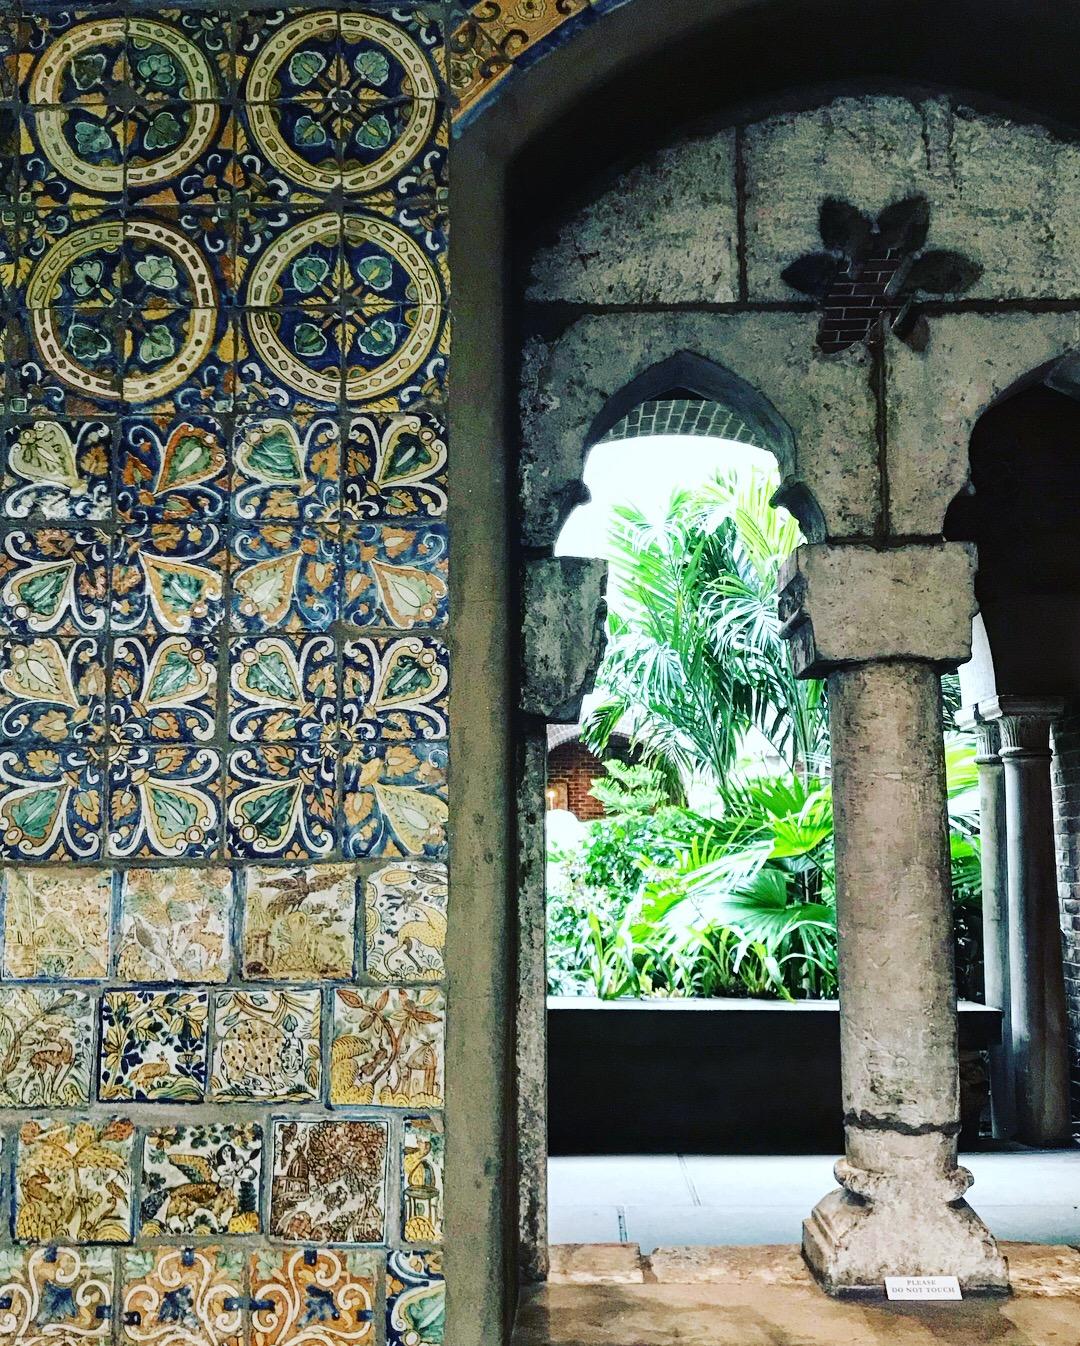 Isabella Stewart Gardner Estate interior tile detail, LGD Team (Crystina Castiglione Photography).